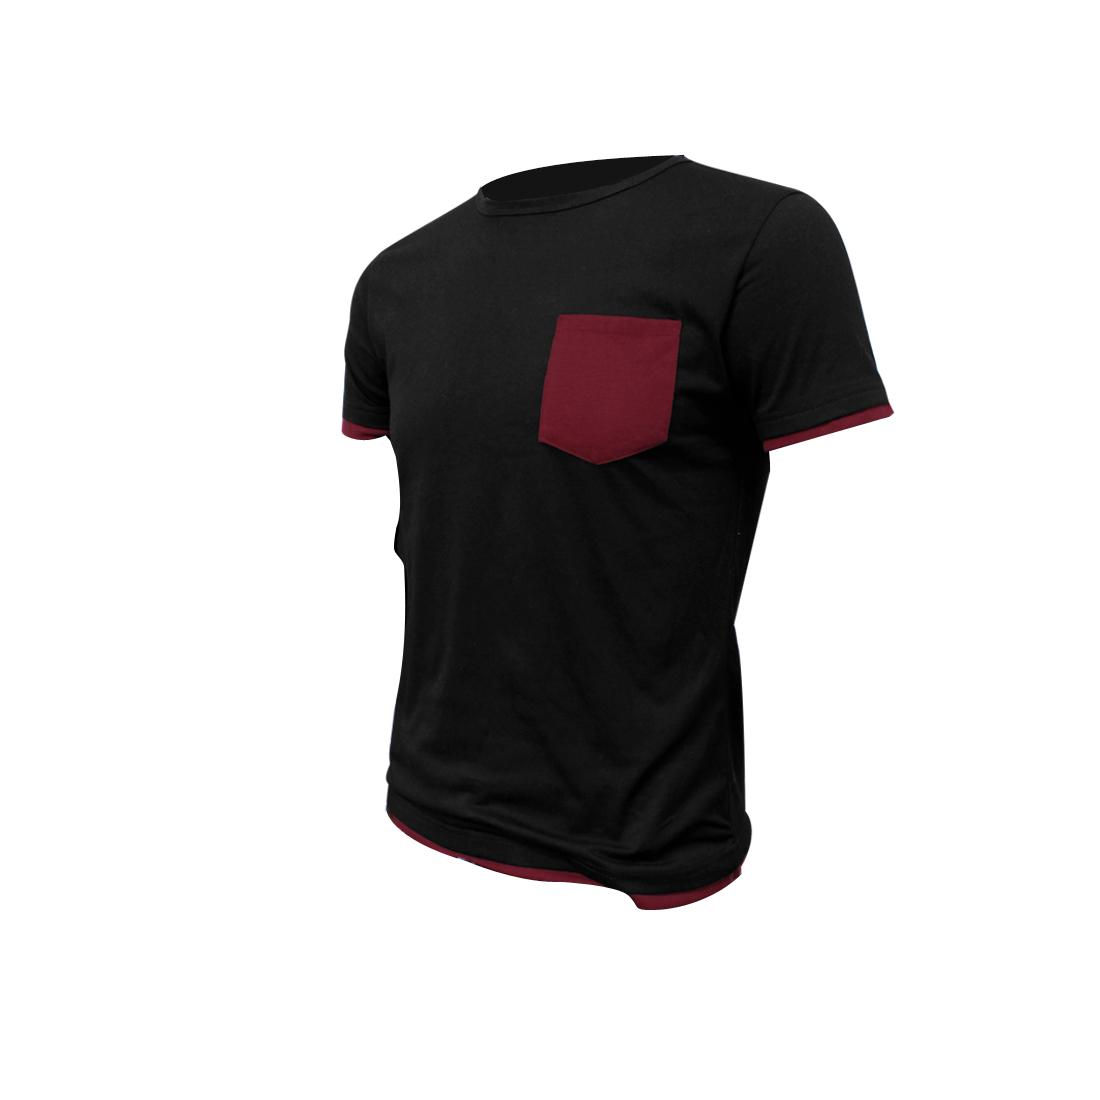 Mens Black Summer New Thin Pullover Basic Short Sleeves Shirt S